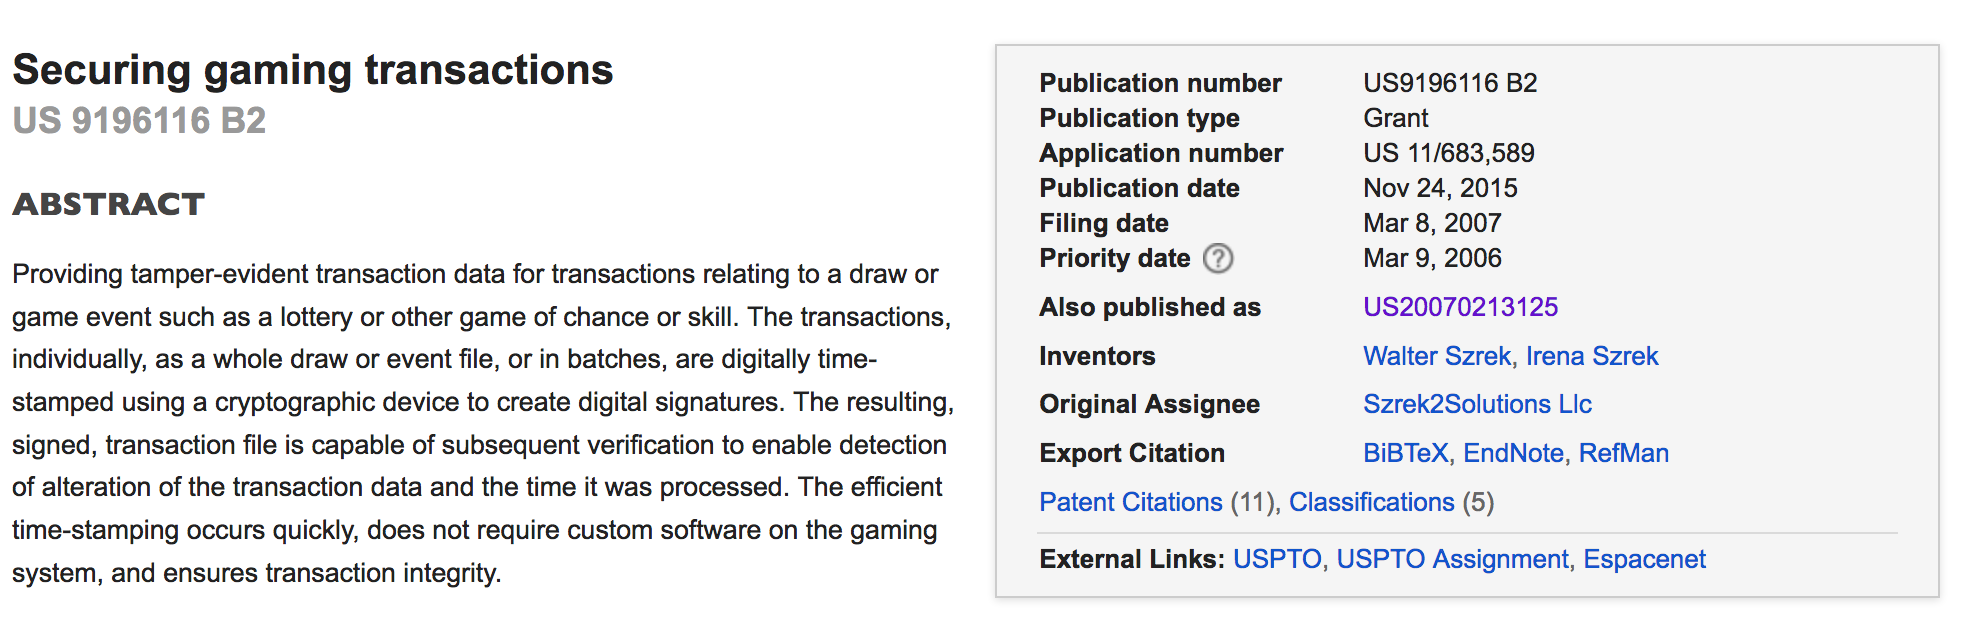 Szrek's 2015 patent